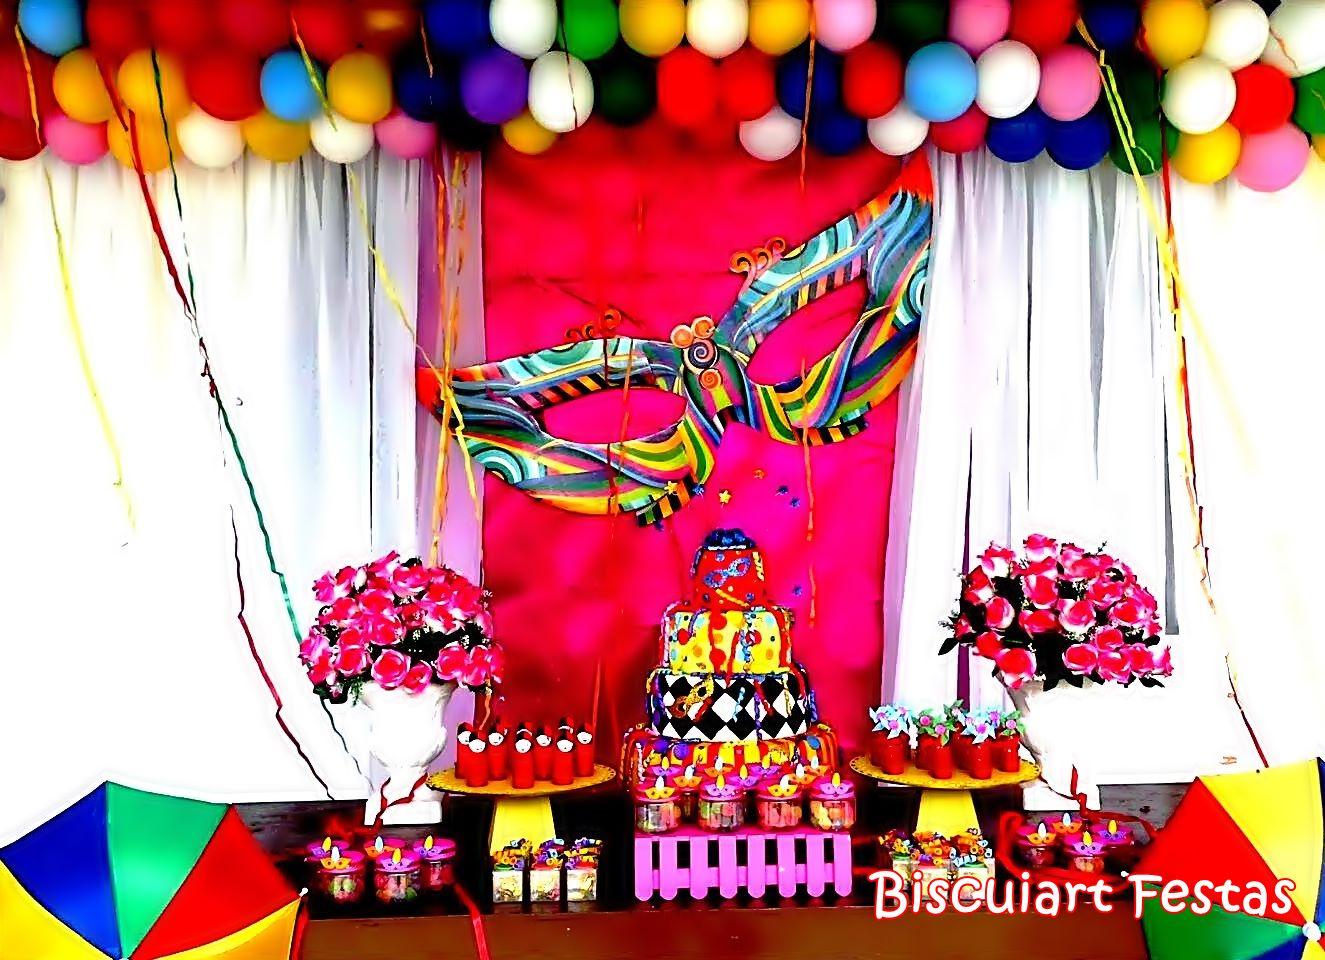 Biscuiart Festas Decoraç u00e3o Carnaval, Festa Carnaval, Aniversário Carnaval -> Decoração De Loja Carnaval